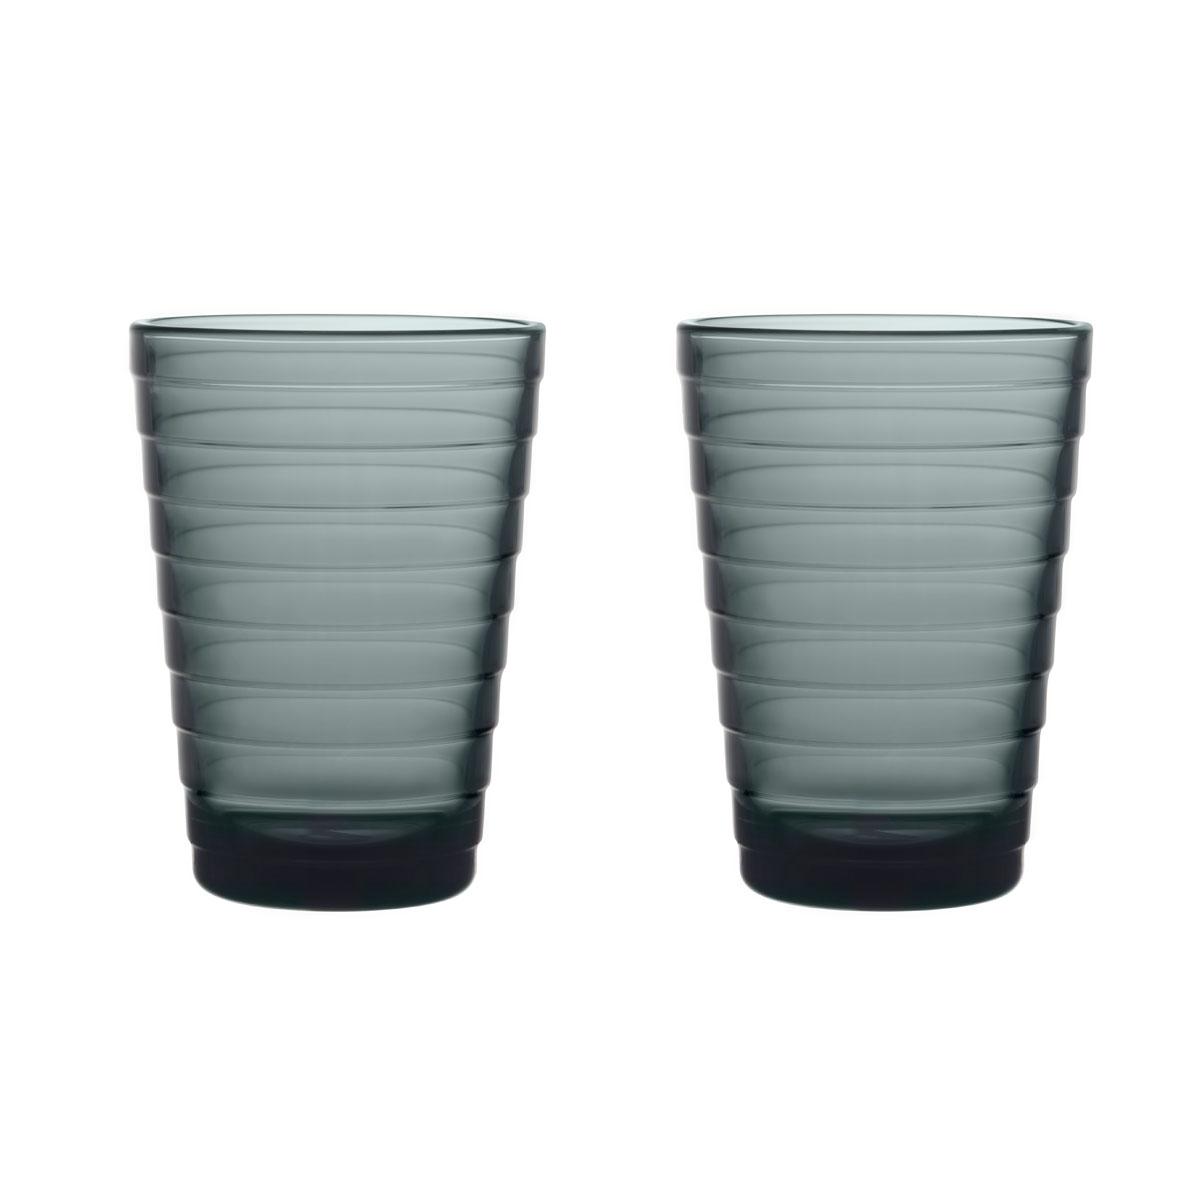 Iittala Designed By Aino Aalto Tumbler 11 Oz Dark Grey Pair